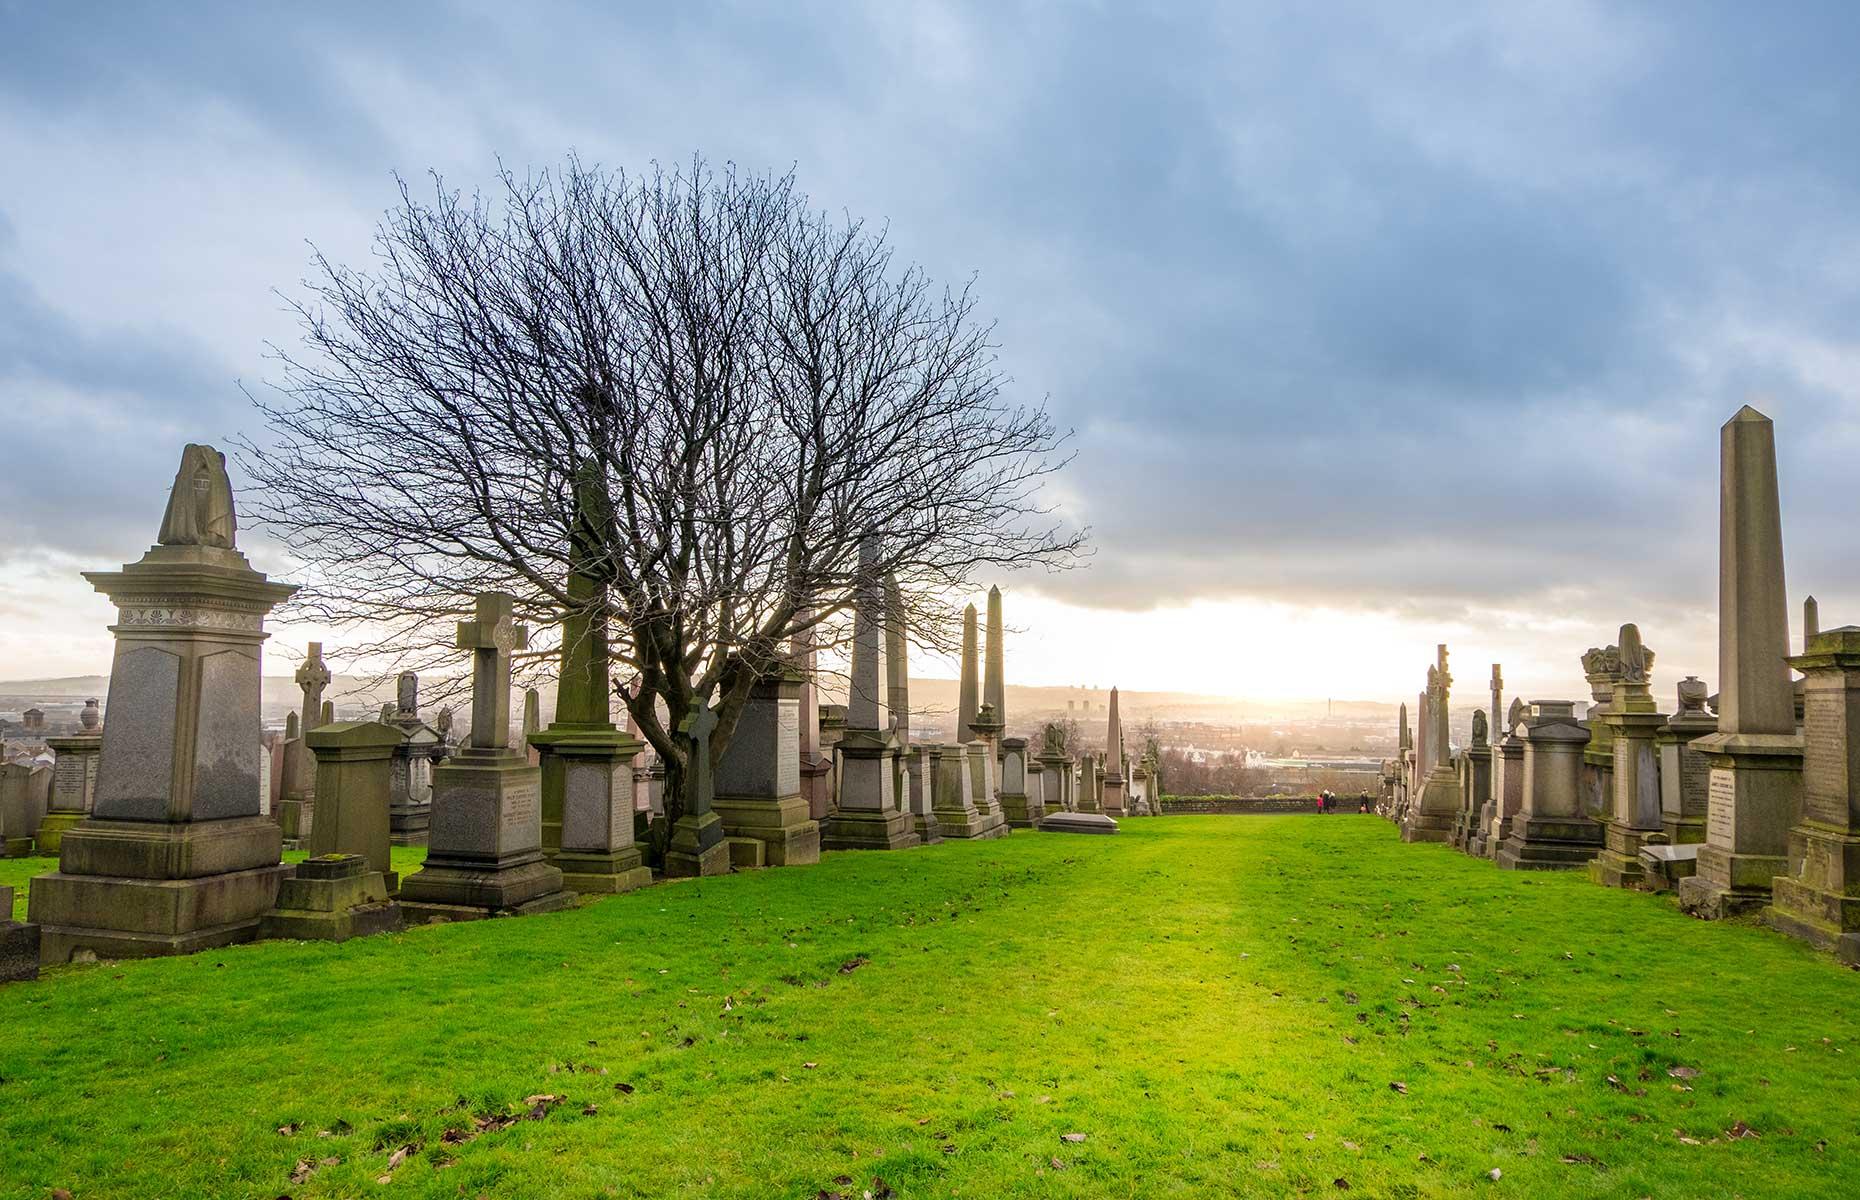 Glasgow Necropolis (Image: Moomusician/Shutterstock)